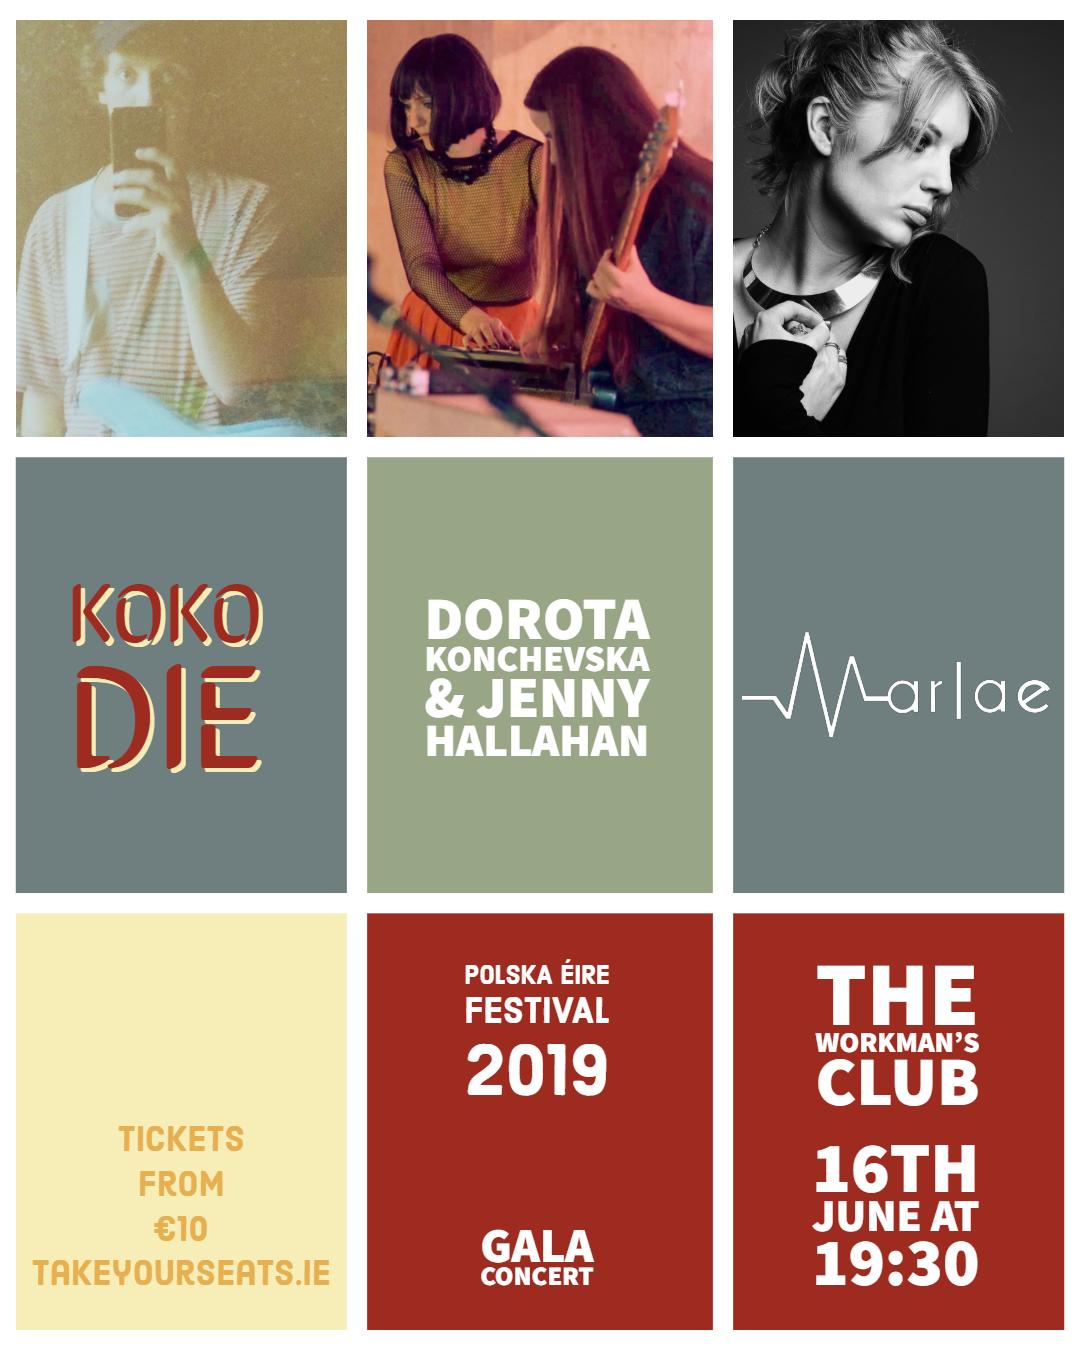 KOKO DIE, Marlae, Dorota Konchevska & Jenny Hallahan in SpaceTime Continuum - PolskaÉire Festival 2019 Gala Concert